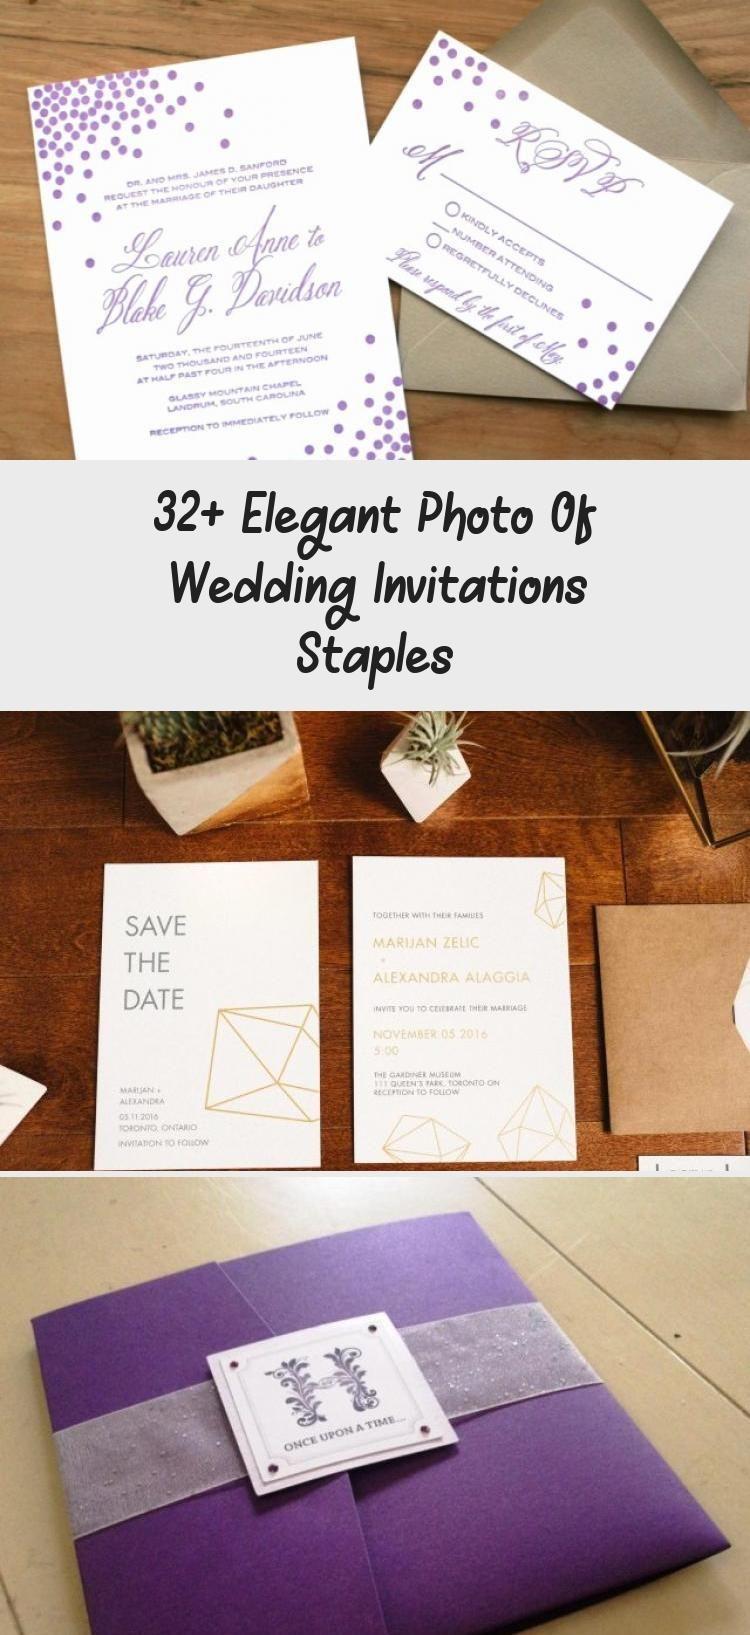 32 Elegant Photo Of Wedding Invitations Staples Staples Wedding Invitations Wedding Invitations Wedding Invitation Kits